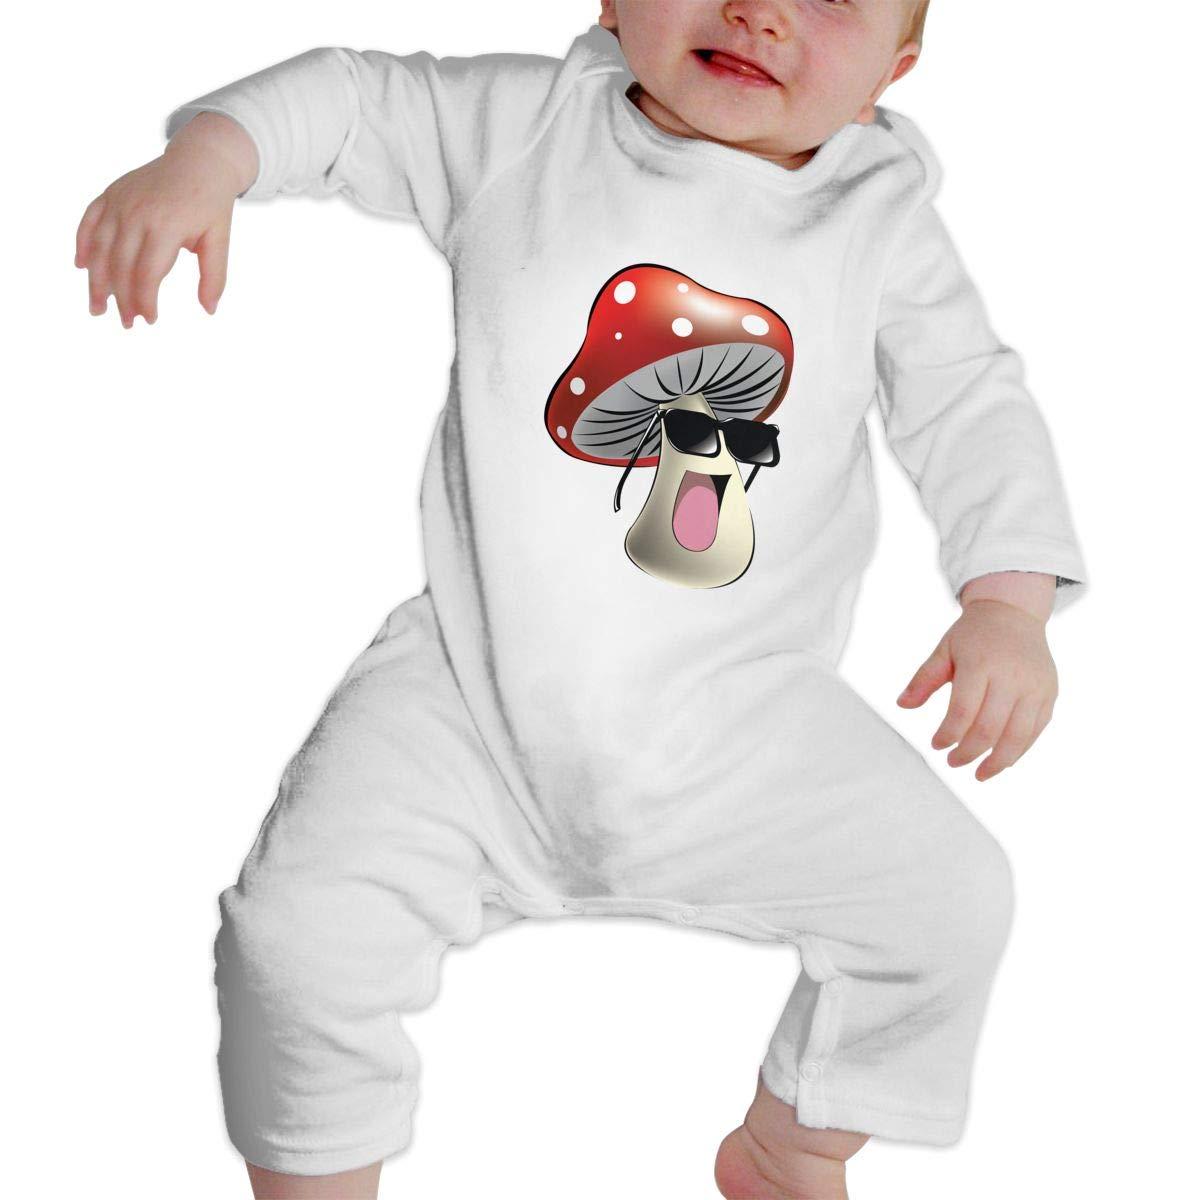 Unisex Baby Cool Mushroom Long Sleeve Romper Bodysuits One Pieces